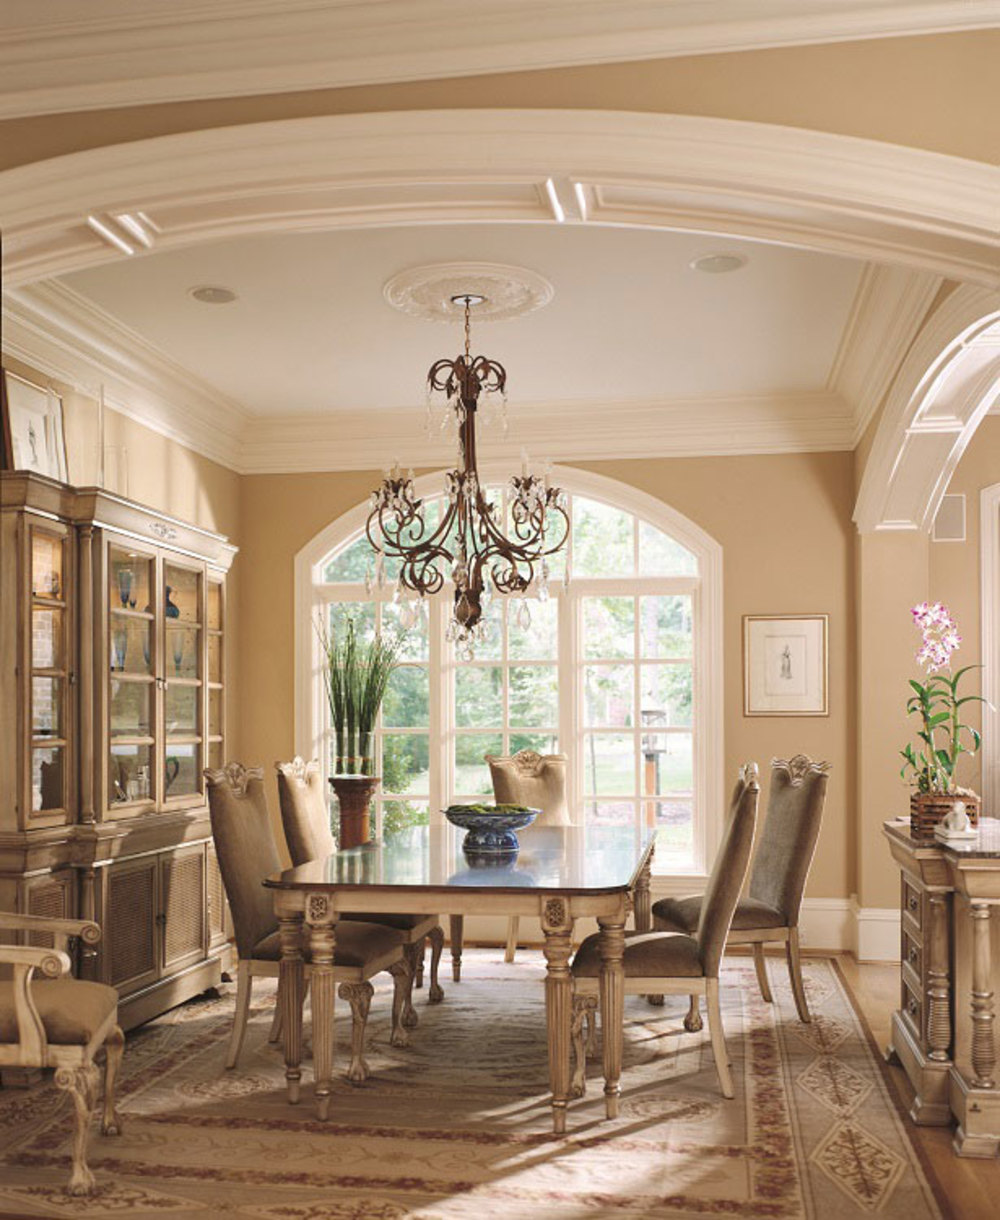 Hurtado - Trianon Dining Table